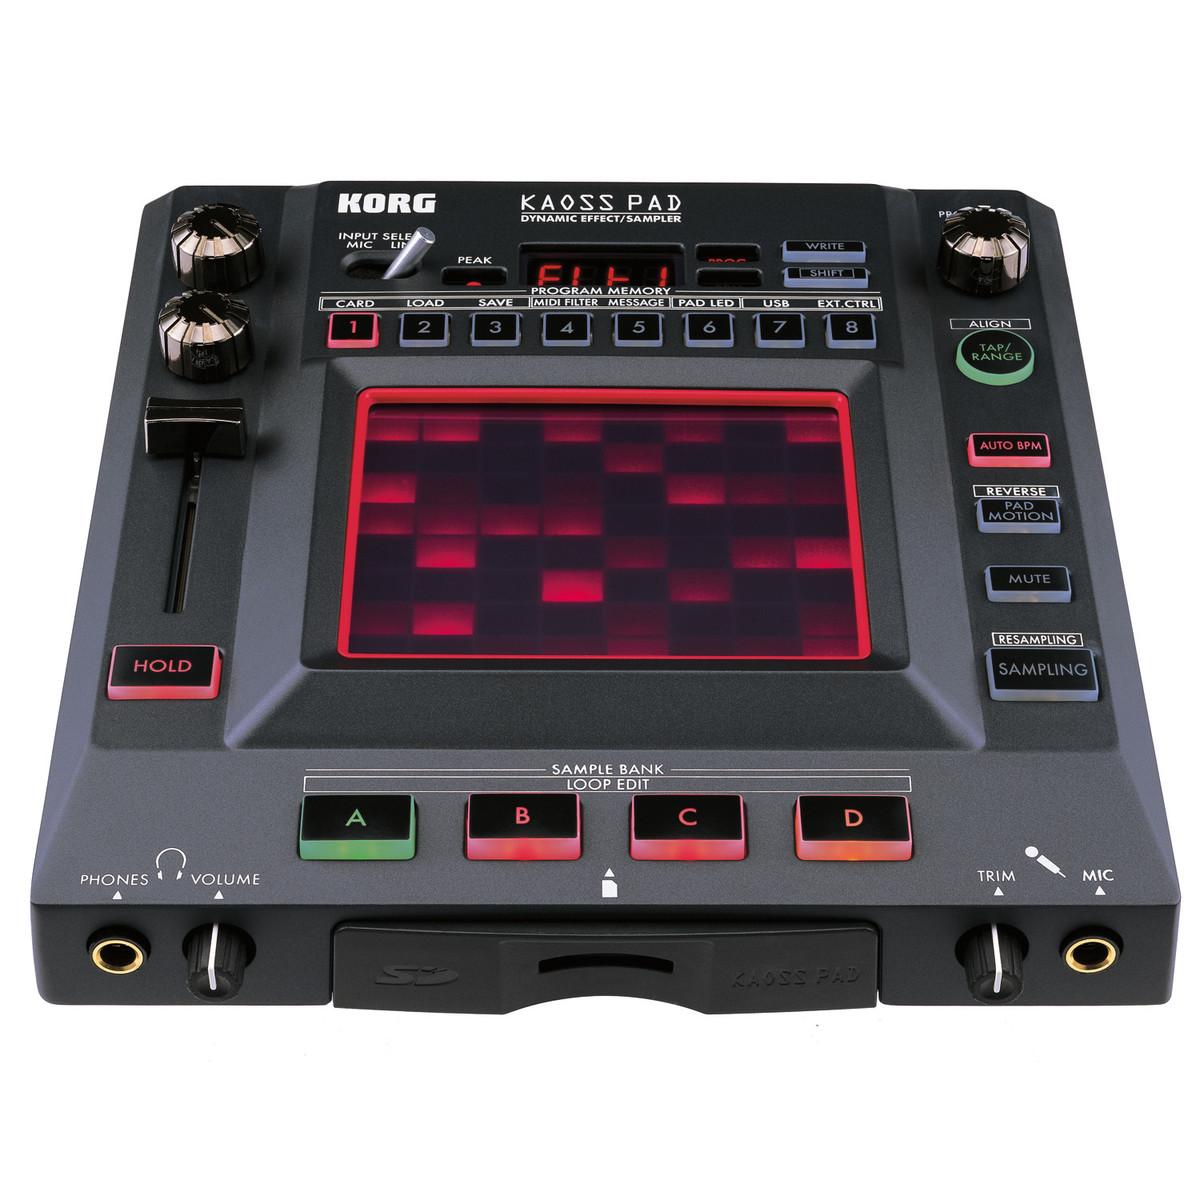 korg kaoss pad kp3 dynamic effects sampler at gear4music